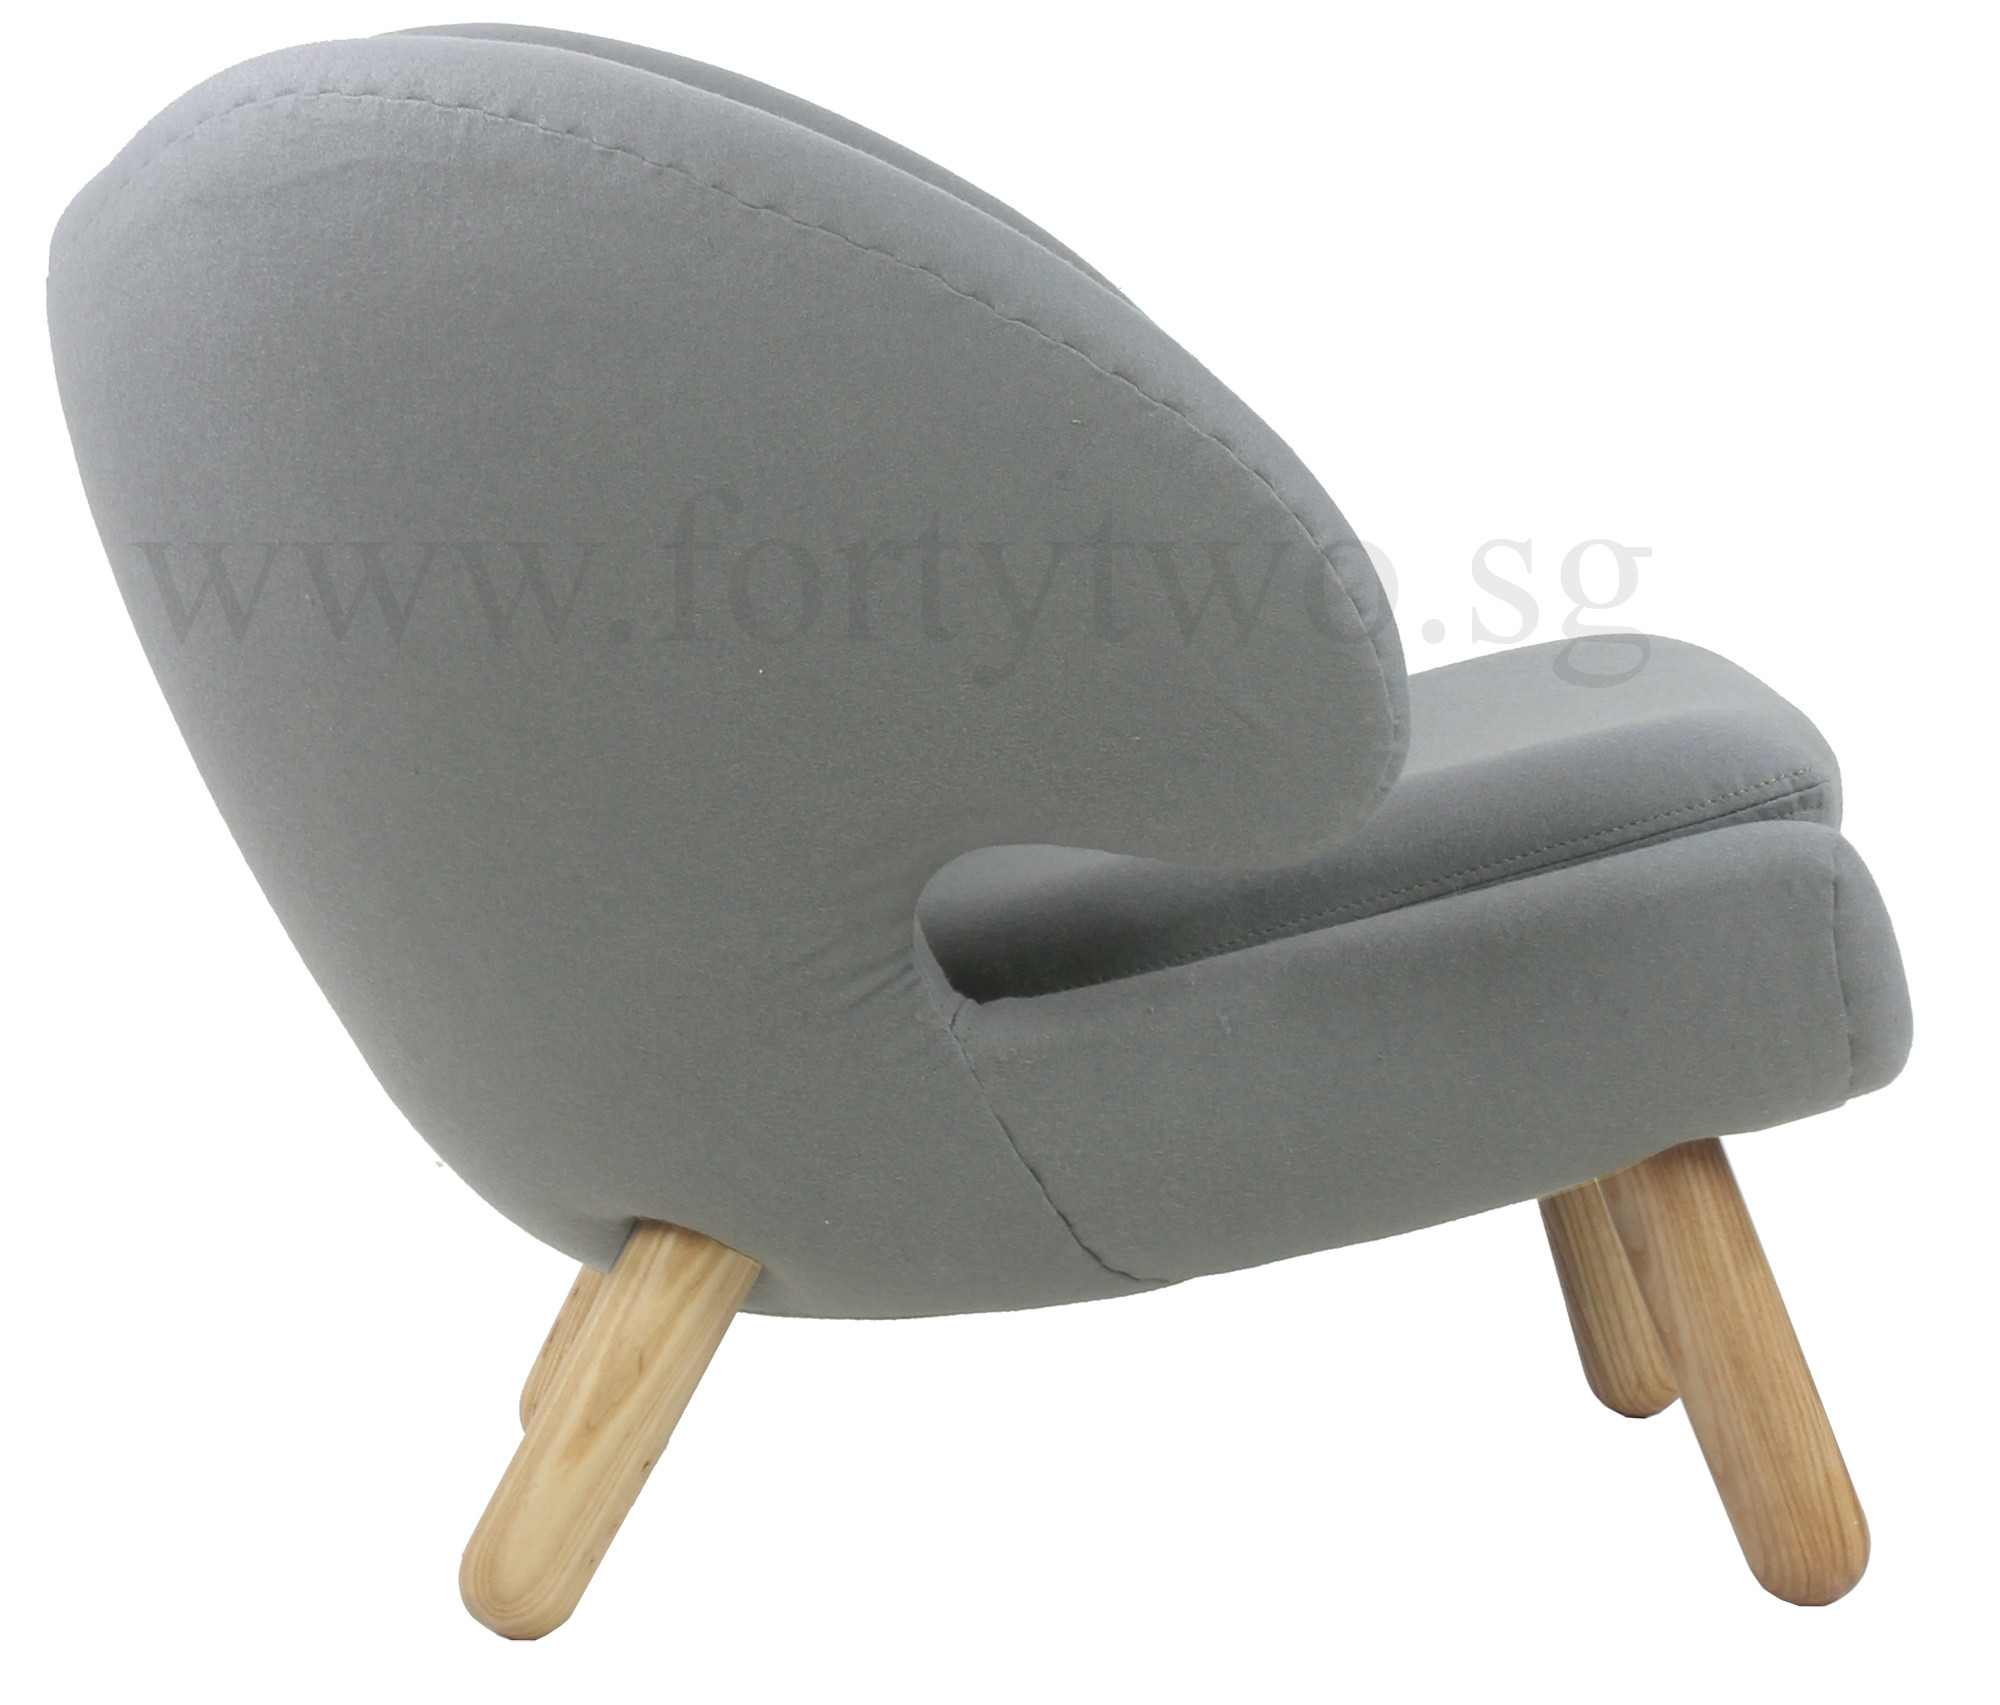 Designer replica pelican chair in light grey furniture for Design replica